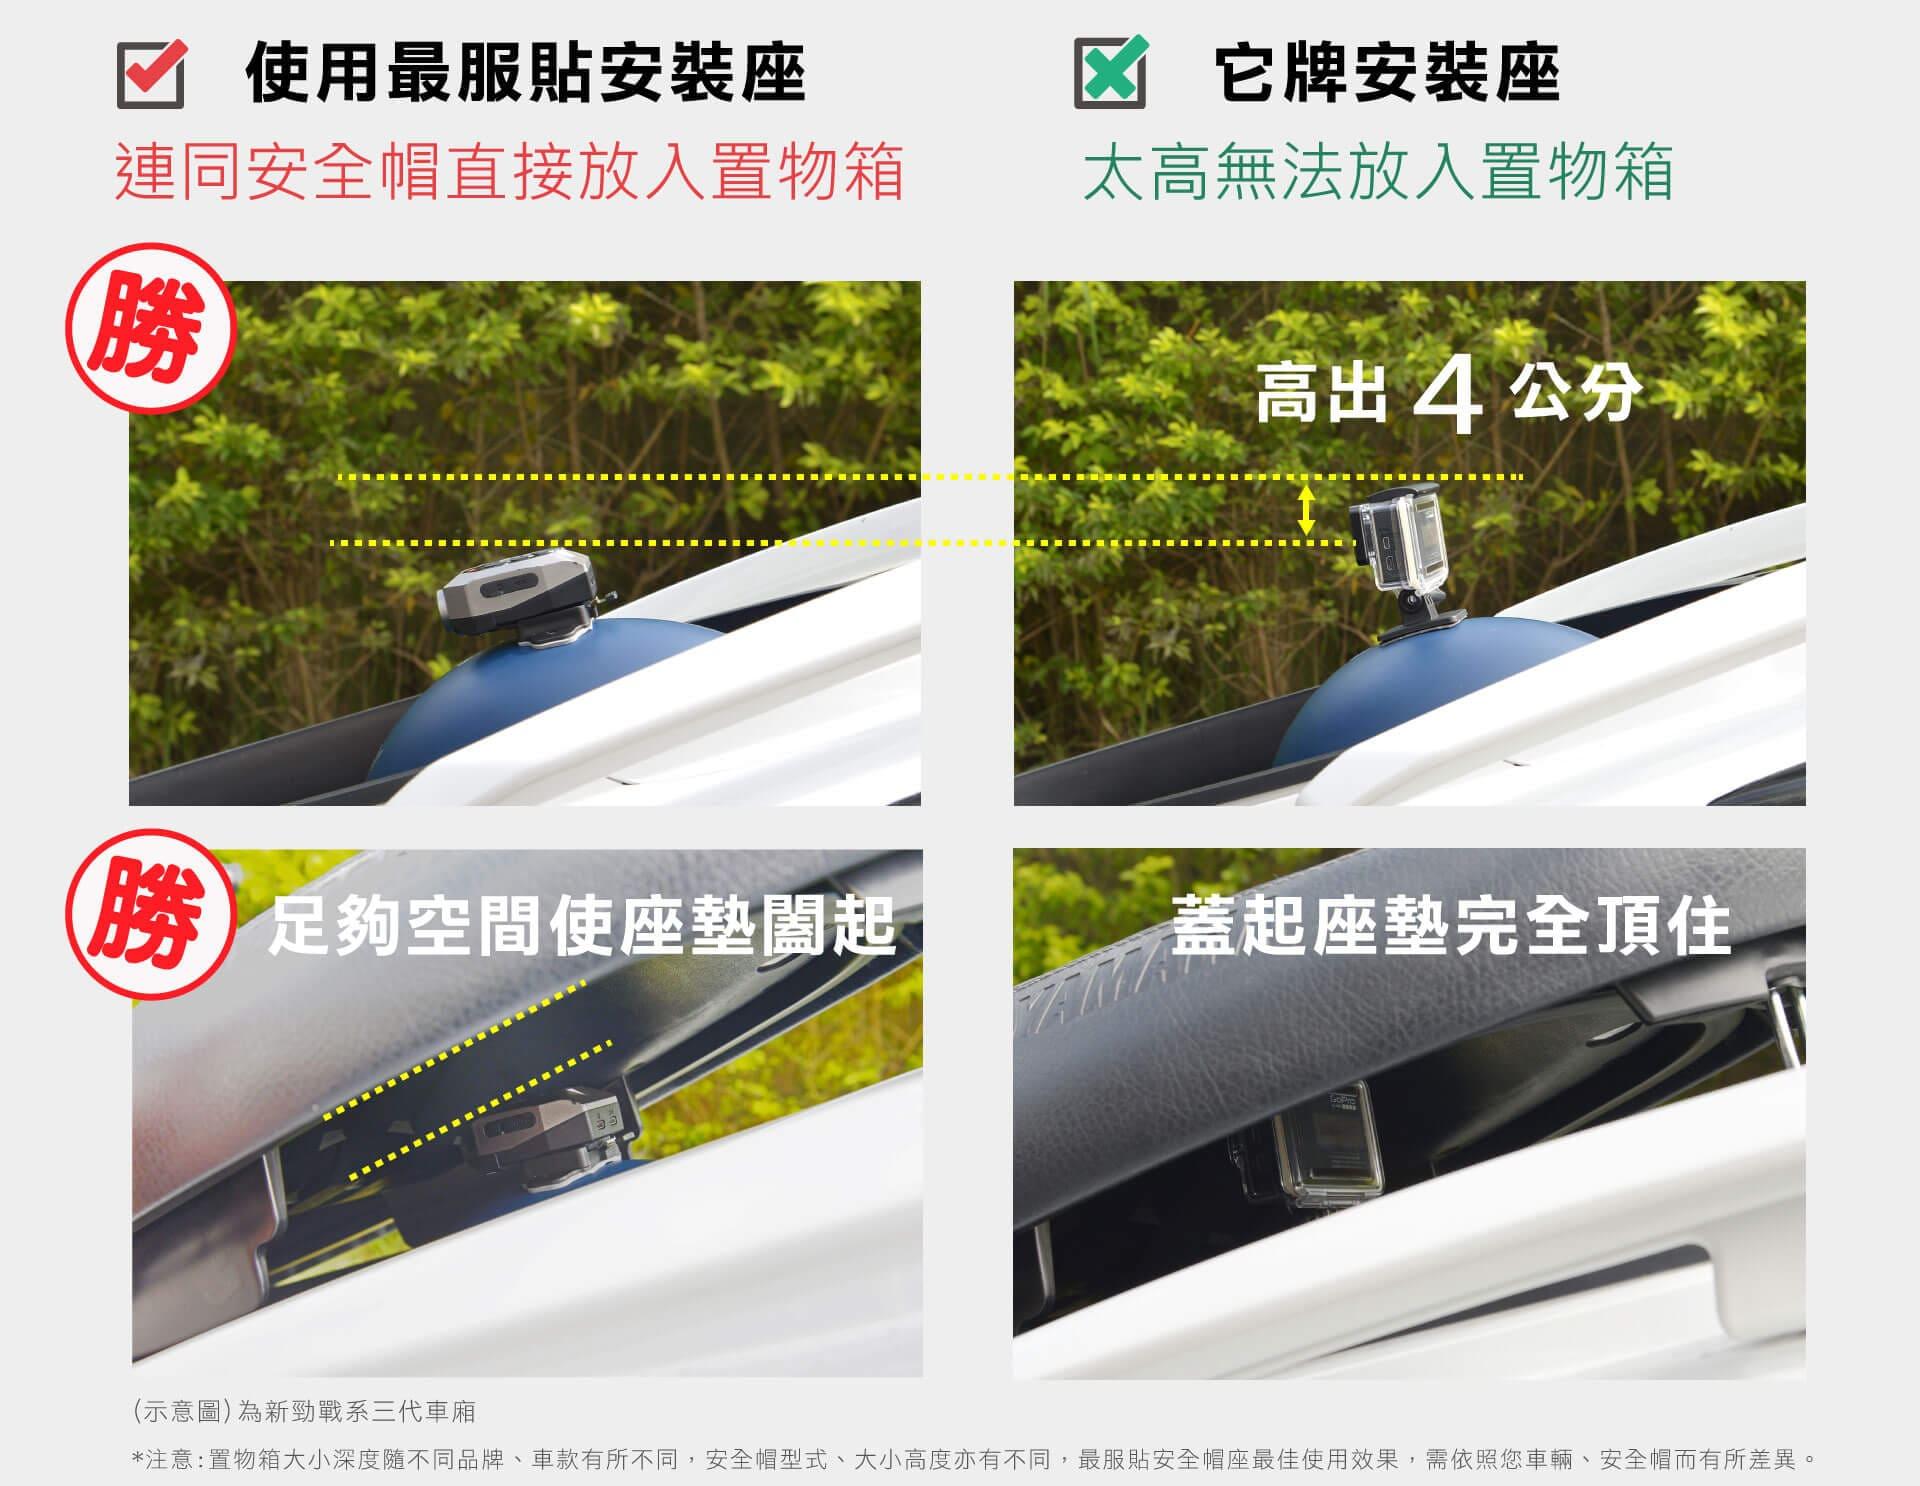 proimages/product/pro-01/pro-01-002/B52X/B52X-08.jpg